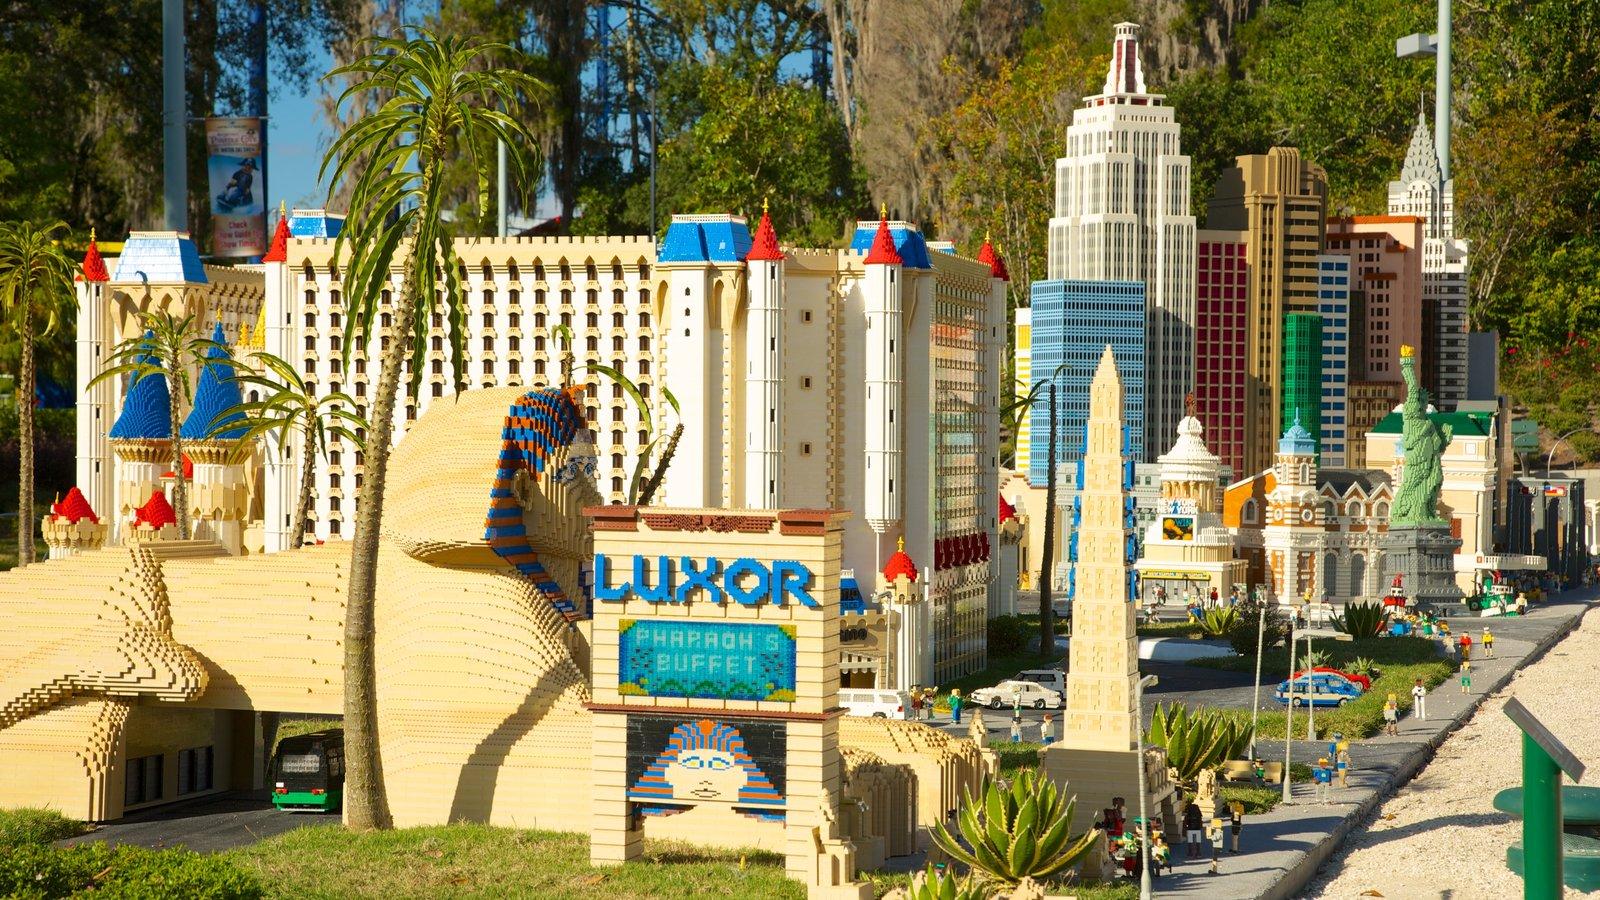 Legoland Florida featuring rides and signage